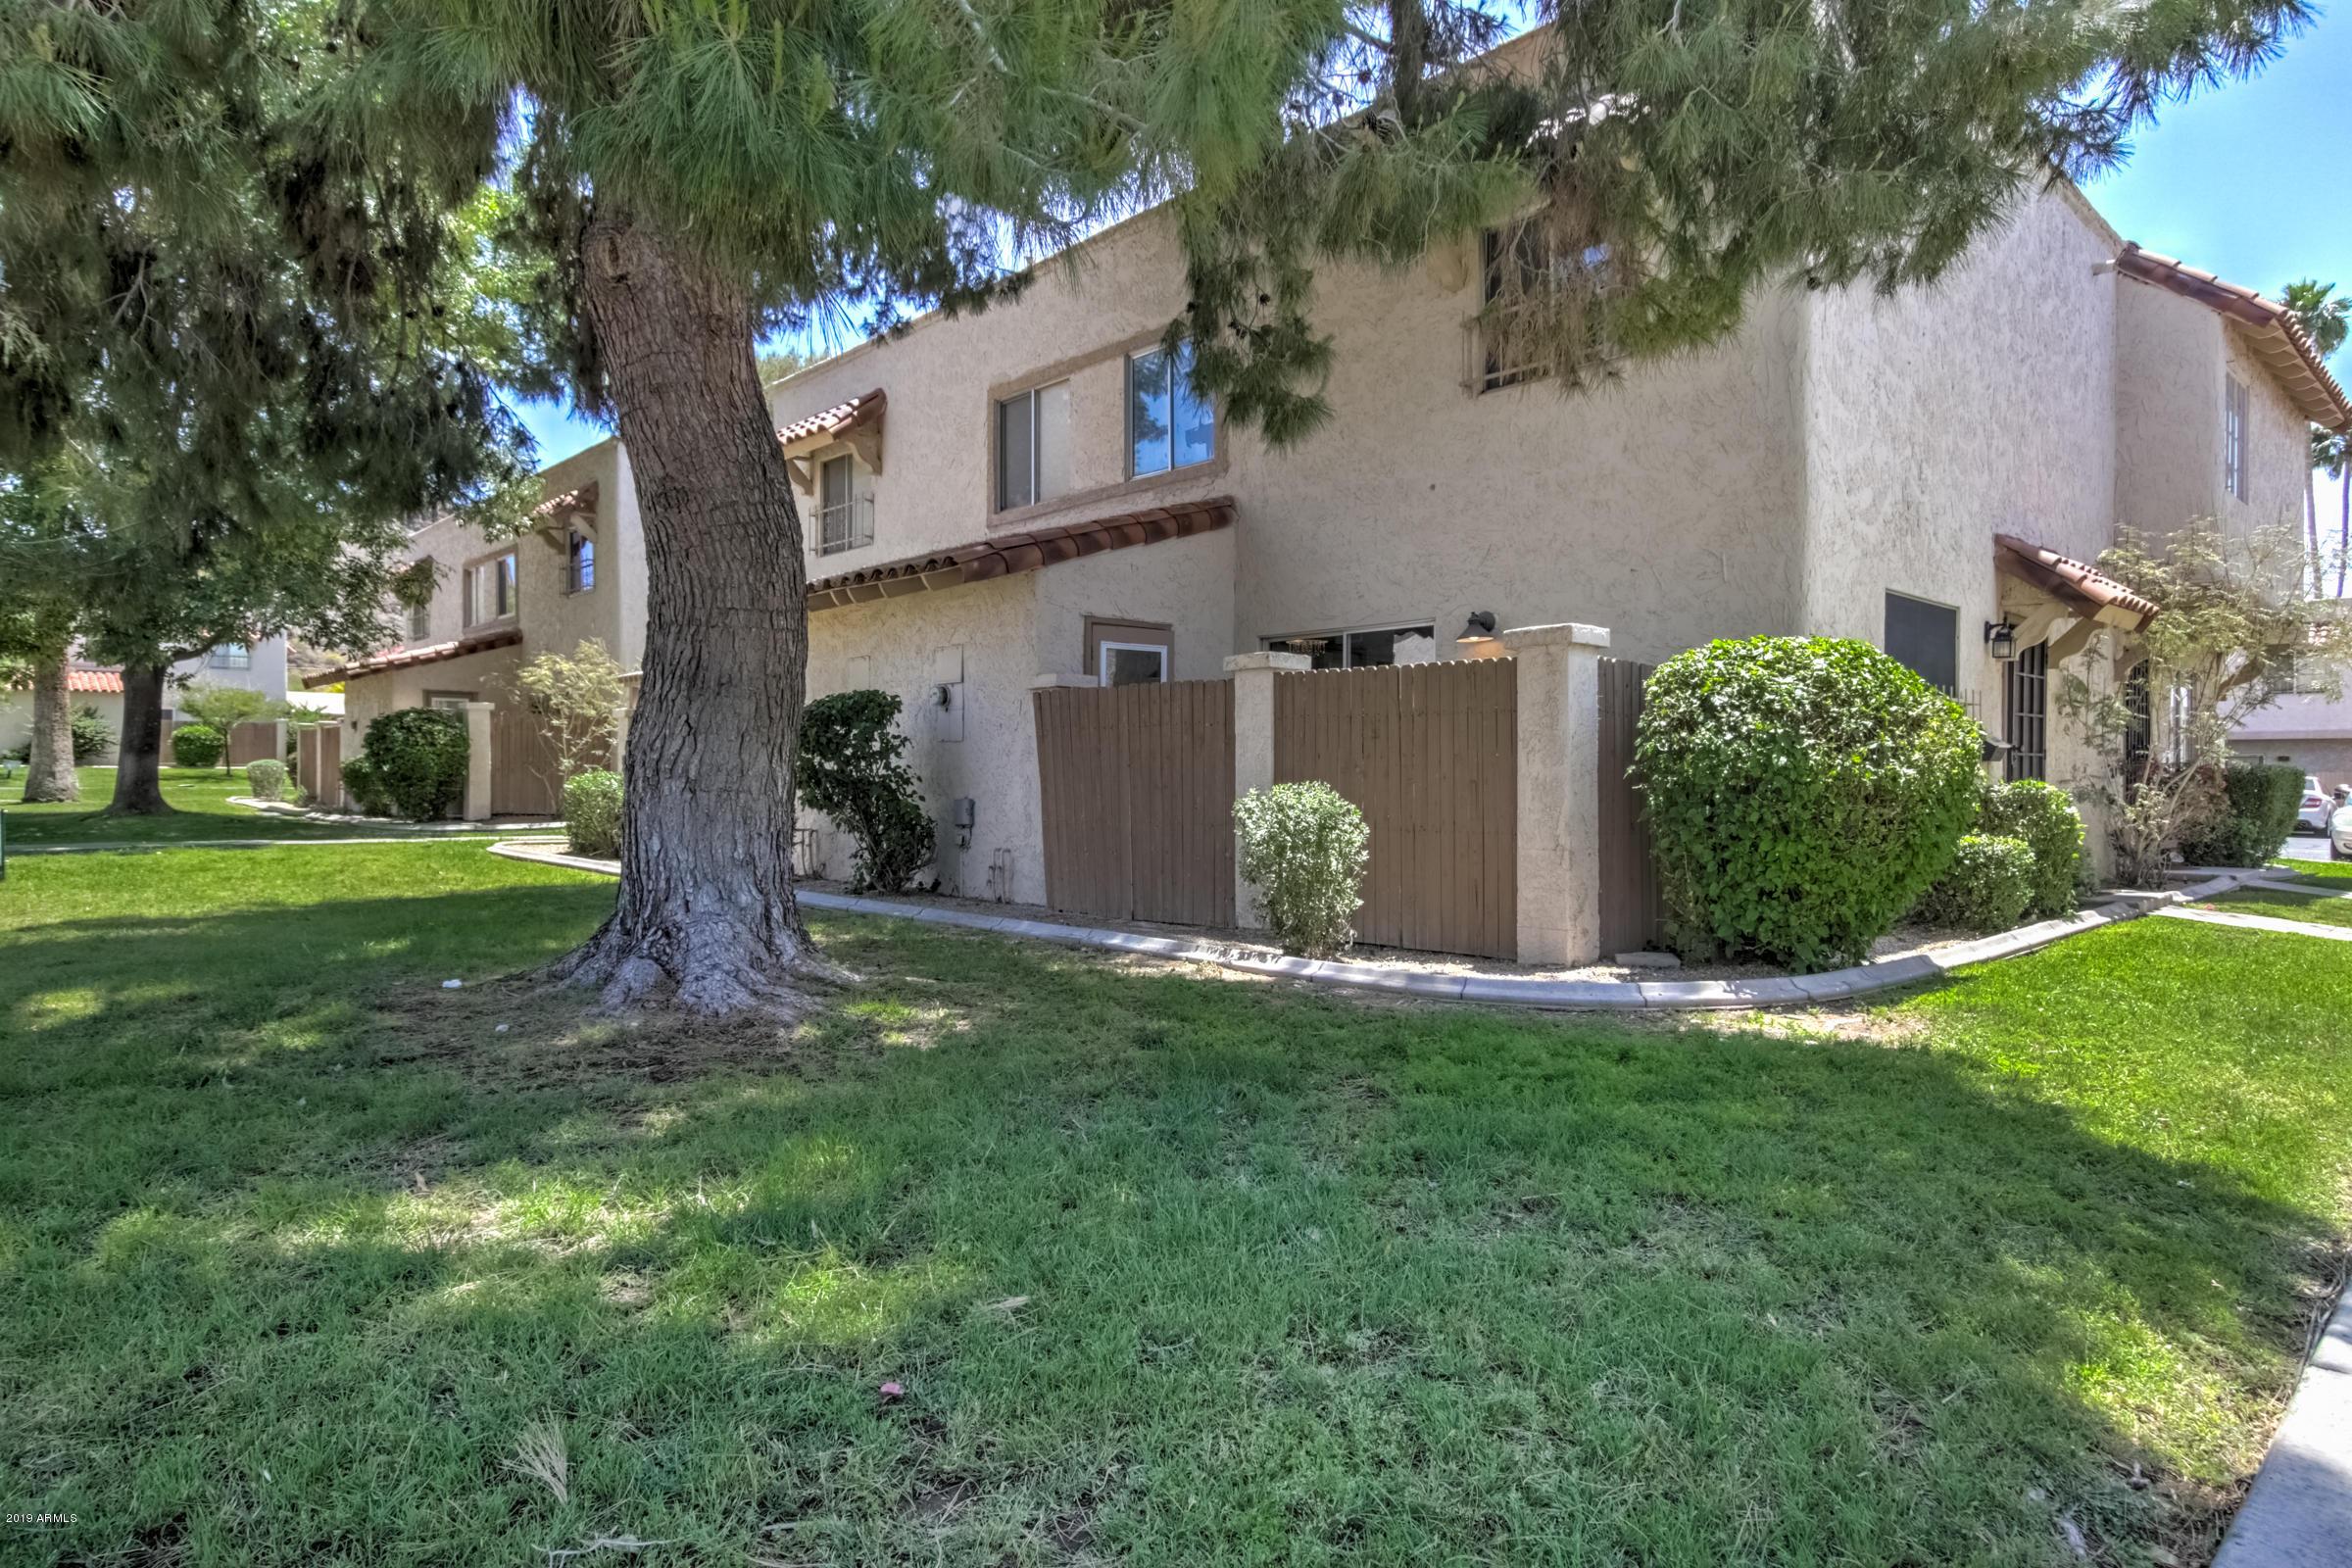 Photo of 1217 E TOWNLEY Avenue, Phoenix, AZ 85020